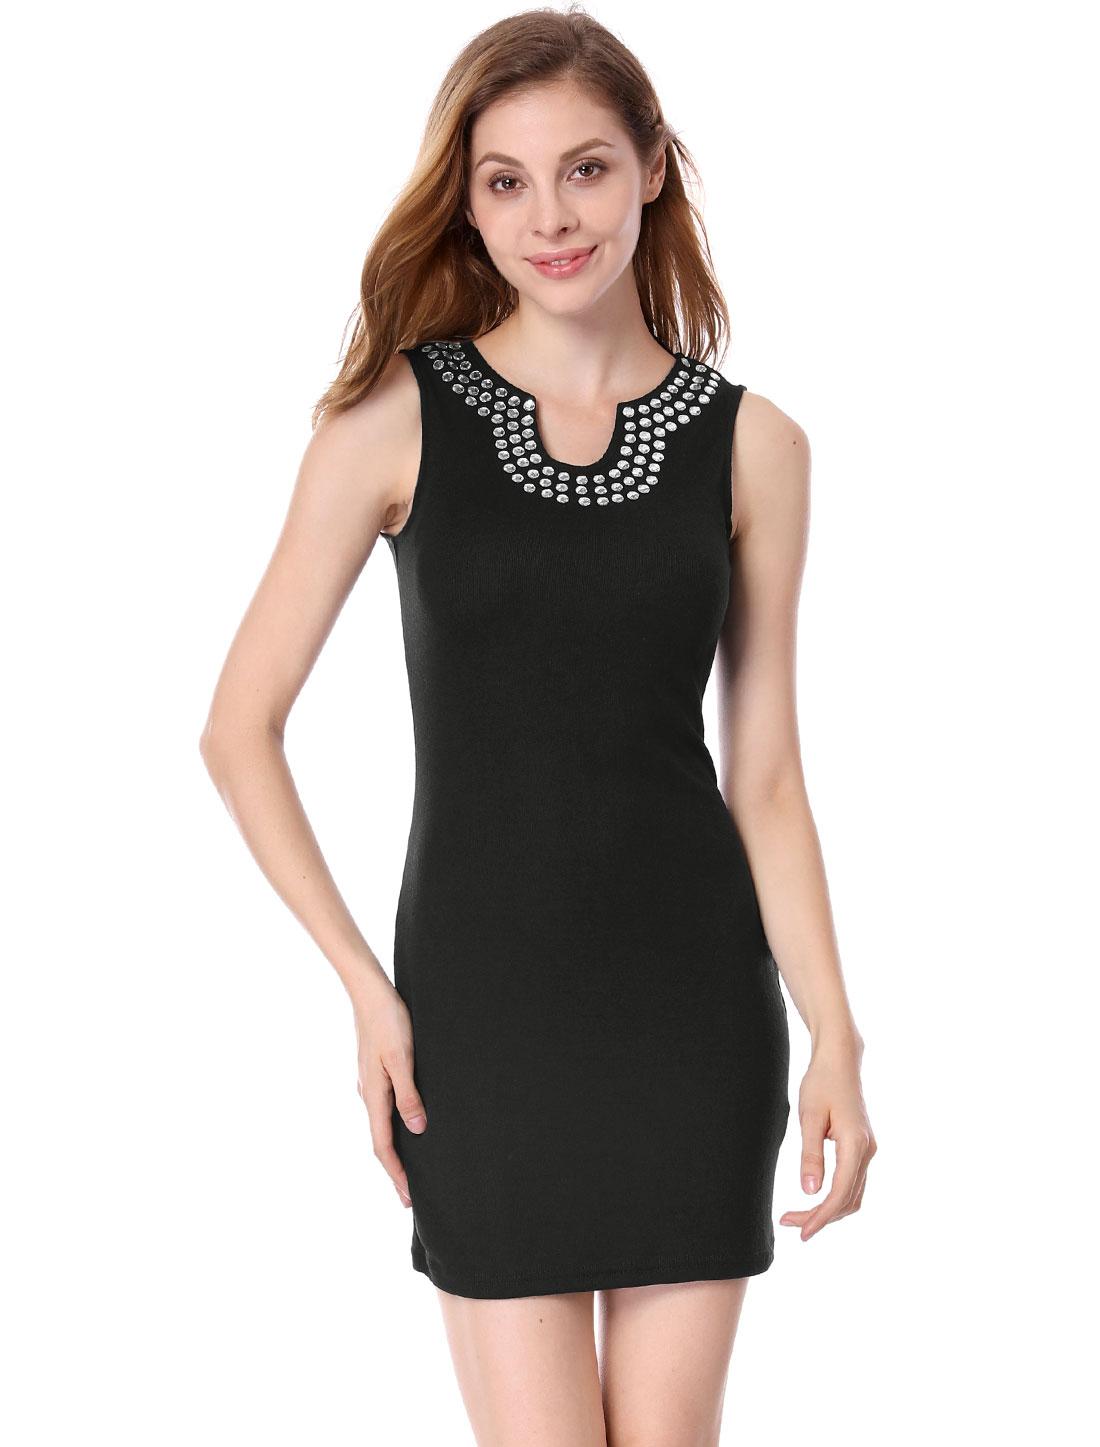 Women Sleeveless Beads Casual Sheath Dresses Black XL